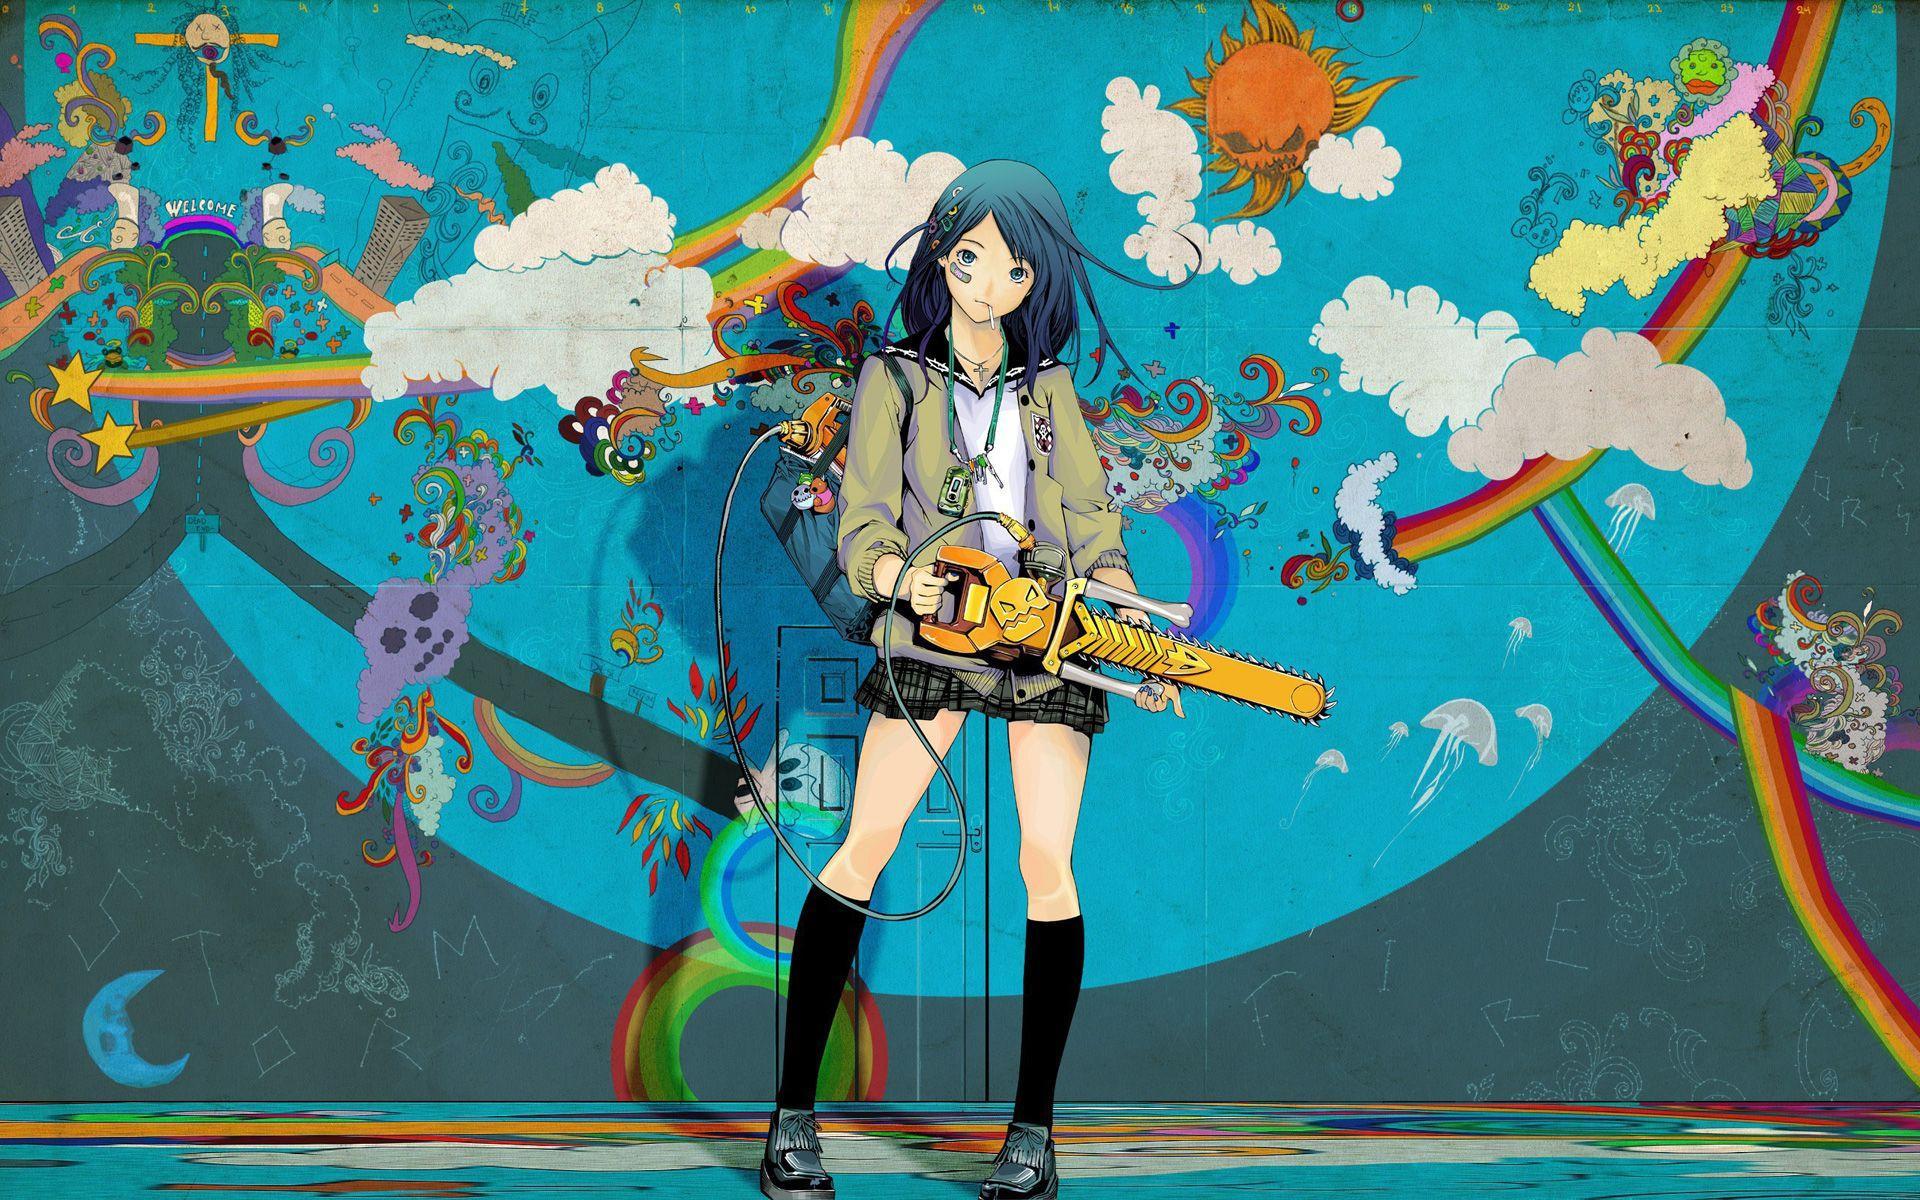 Amazing Anime Manga Digital Art Anime Wallpapercoolvibe